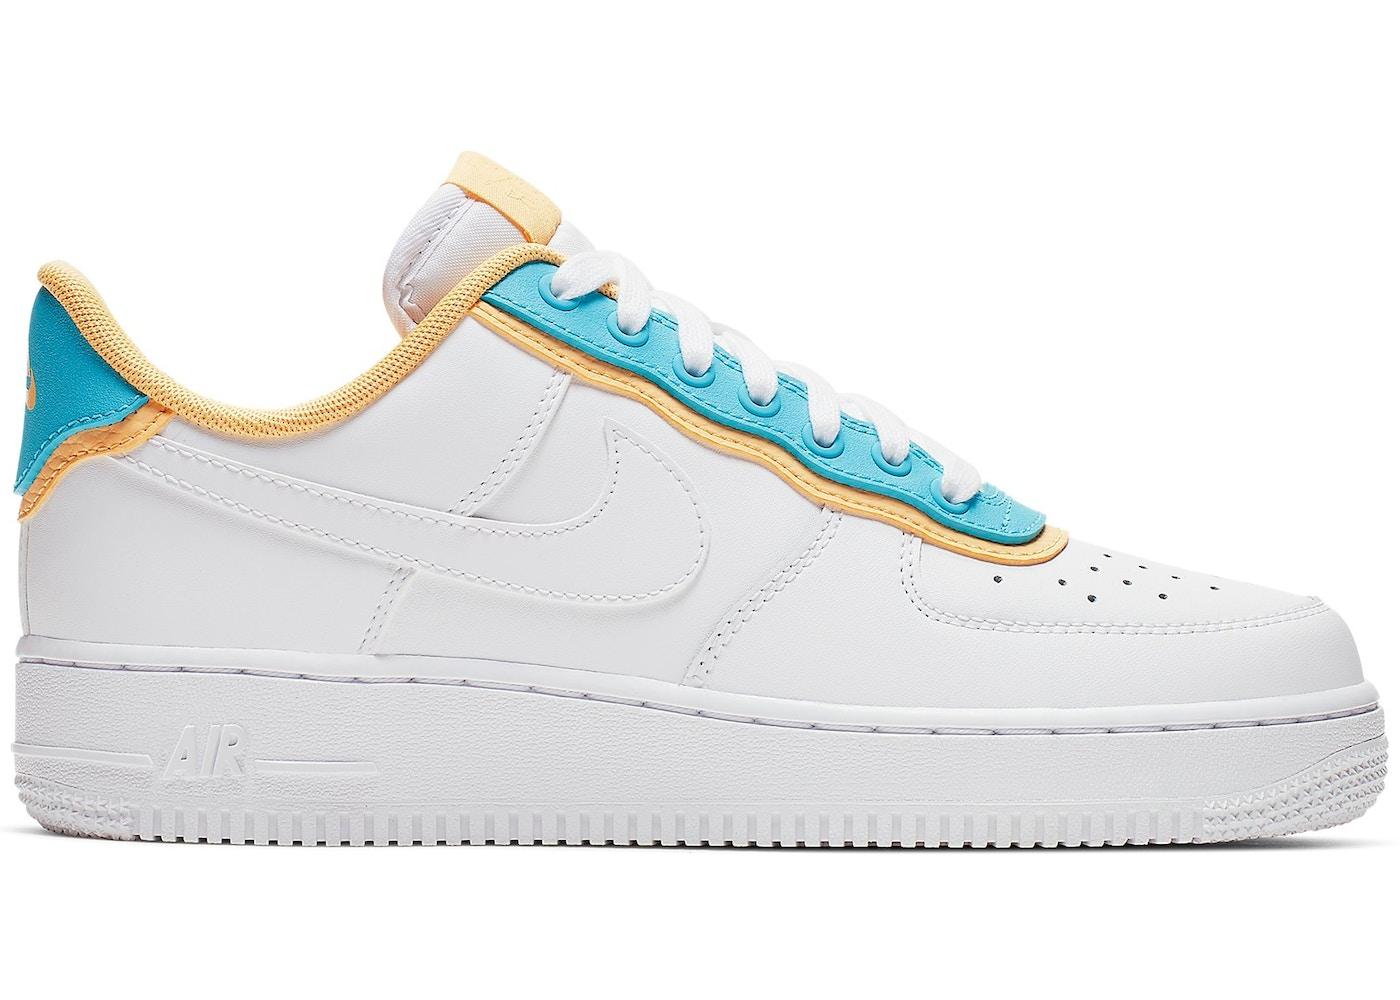 Nike Air Force 1 Low SE White Light Blue Fury Topaz Gold (W)